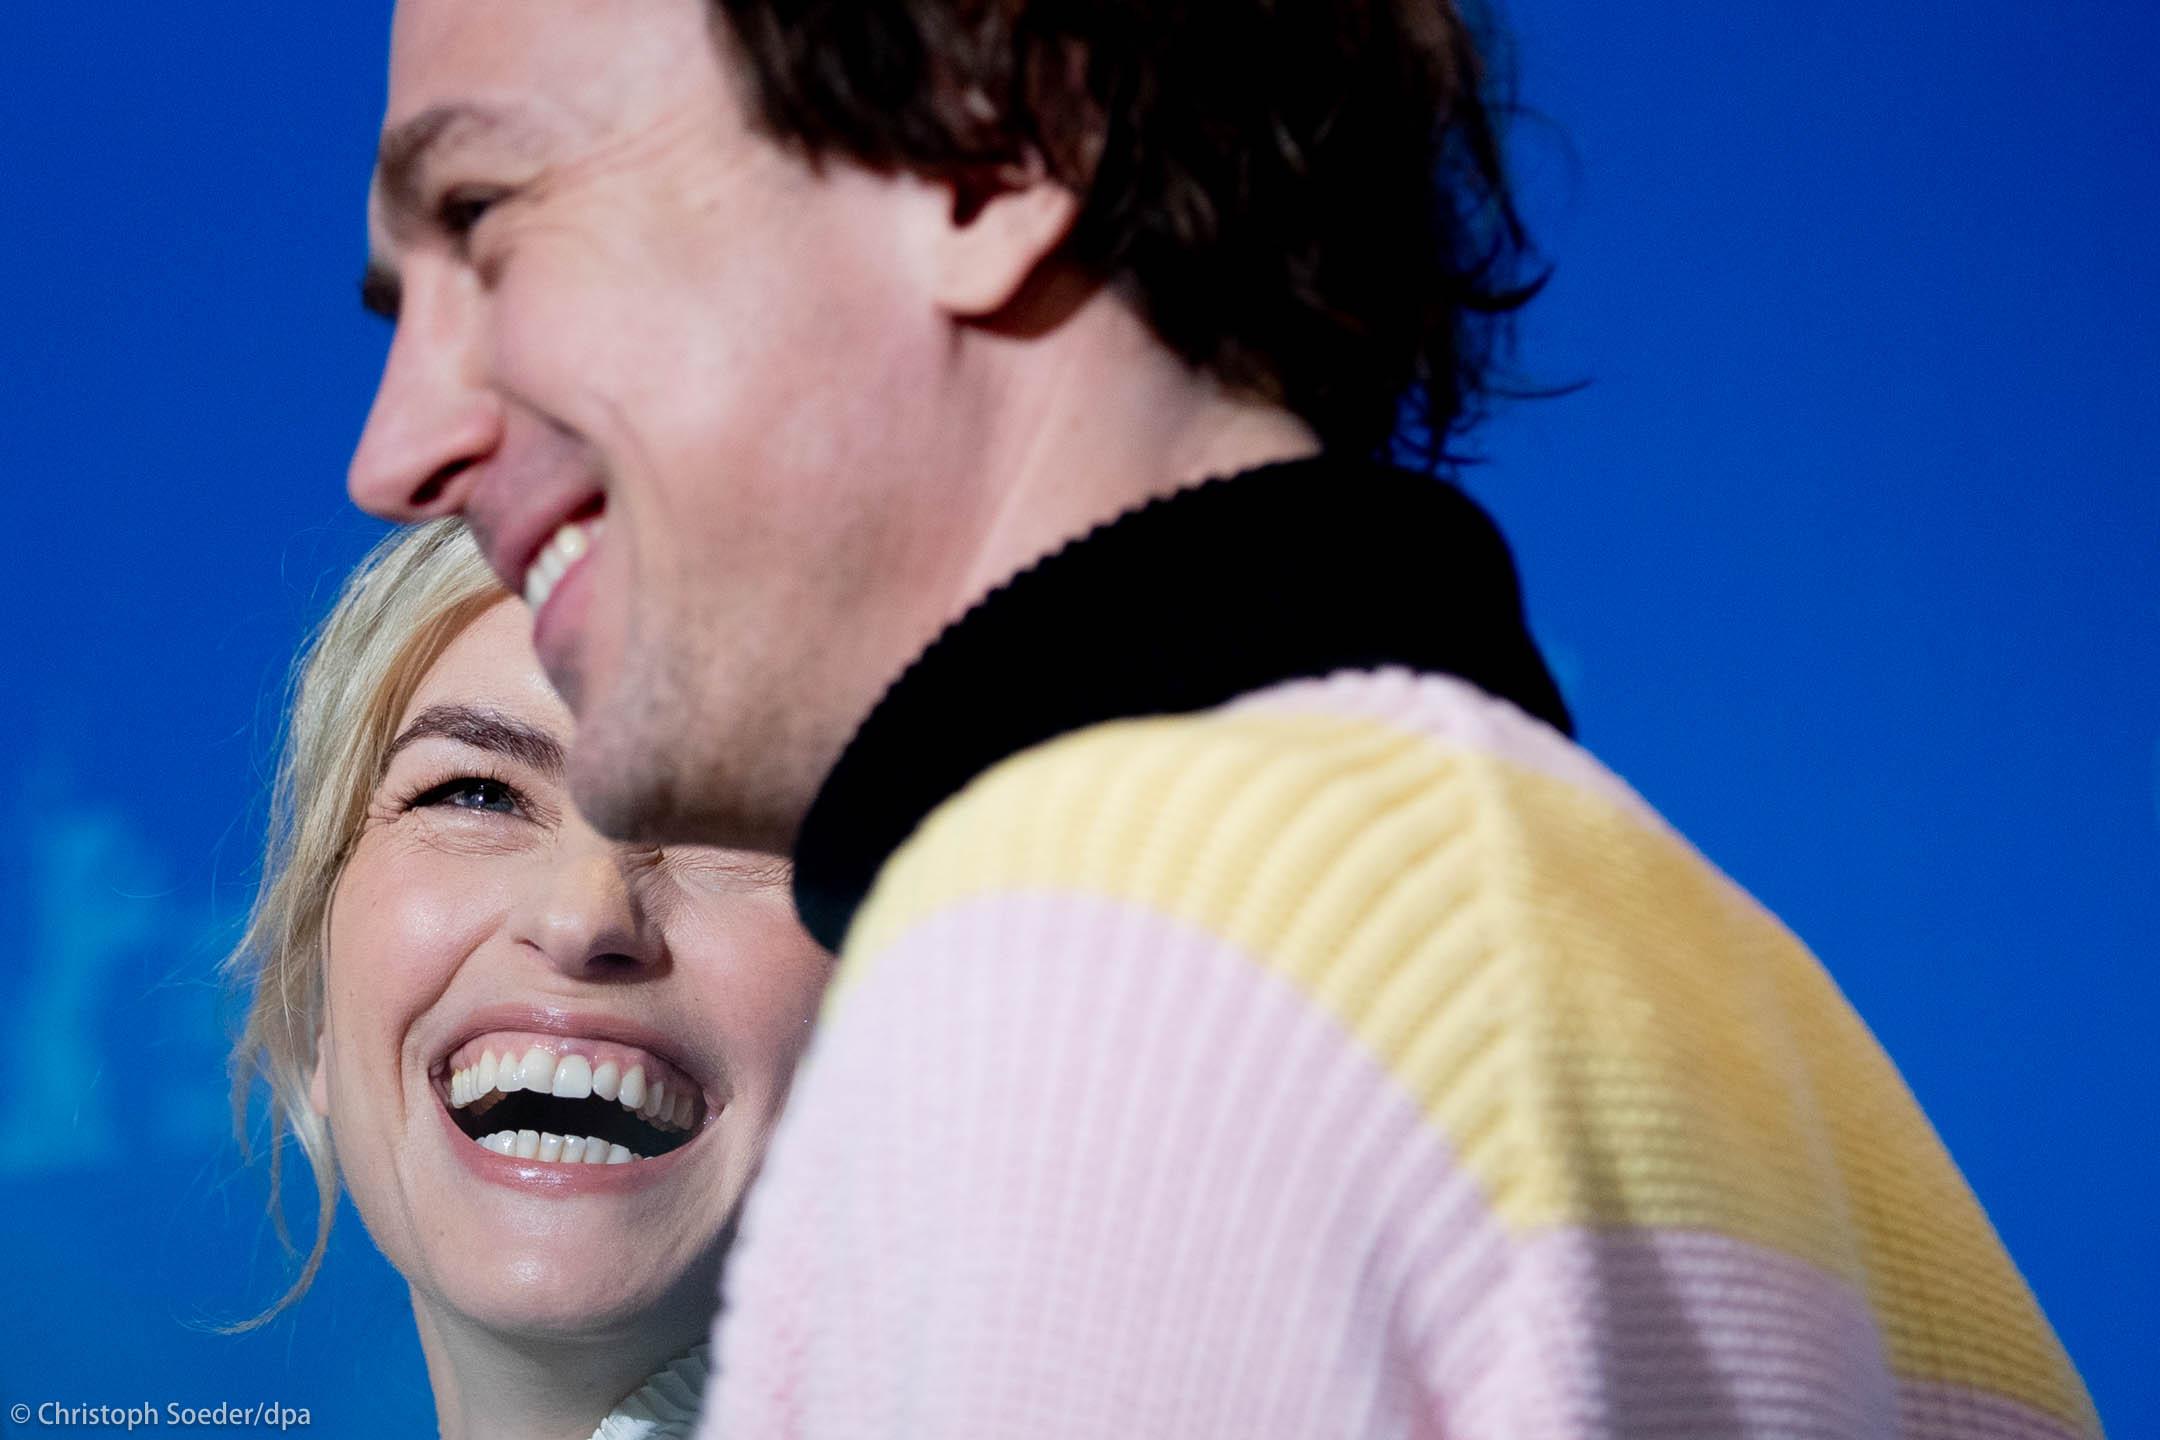 Actors Lars Eidinger and Nina Hoss